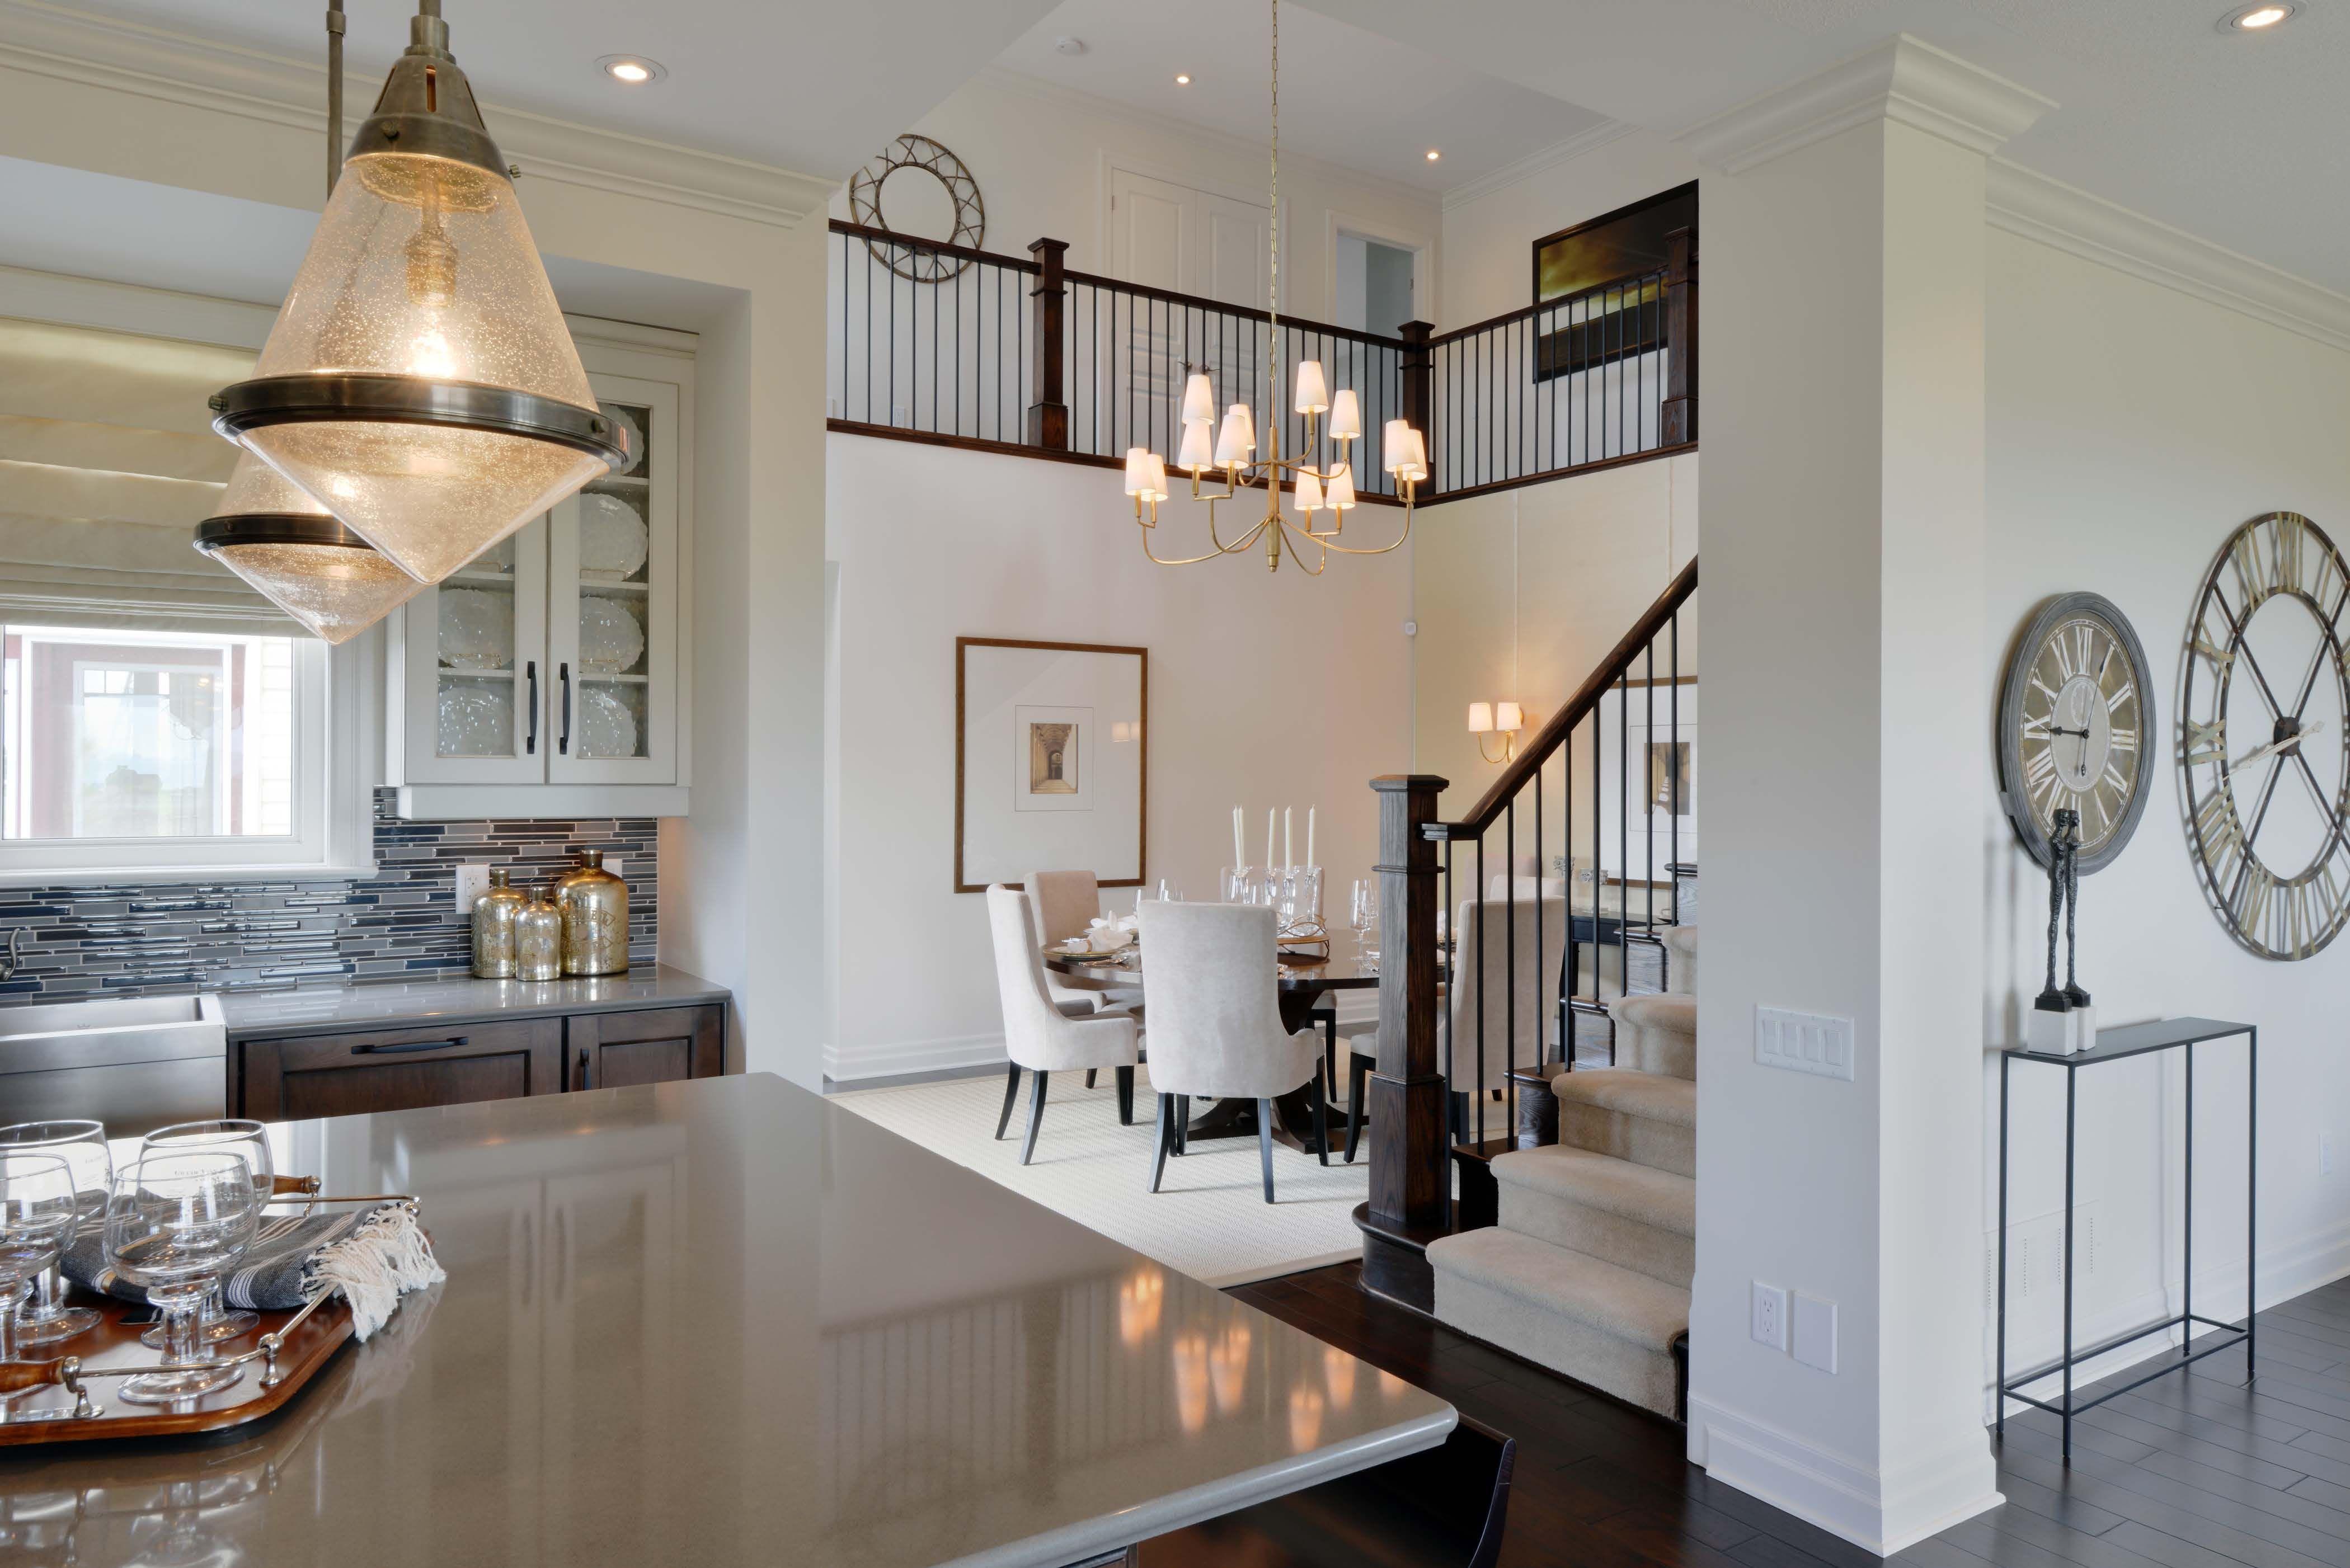 blackstone homes model main floor the black and white motif is so chic - Blackstone Home Design